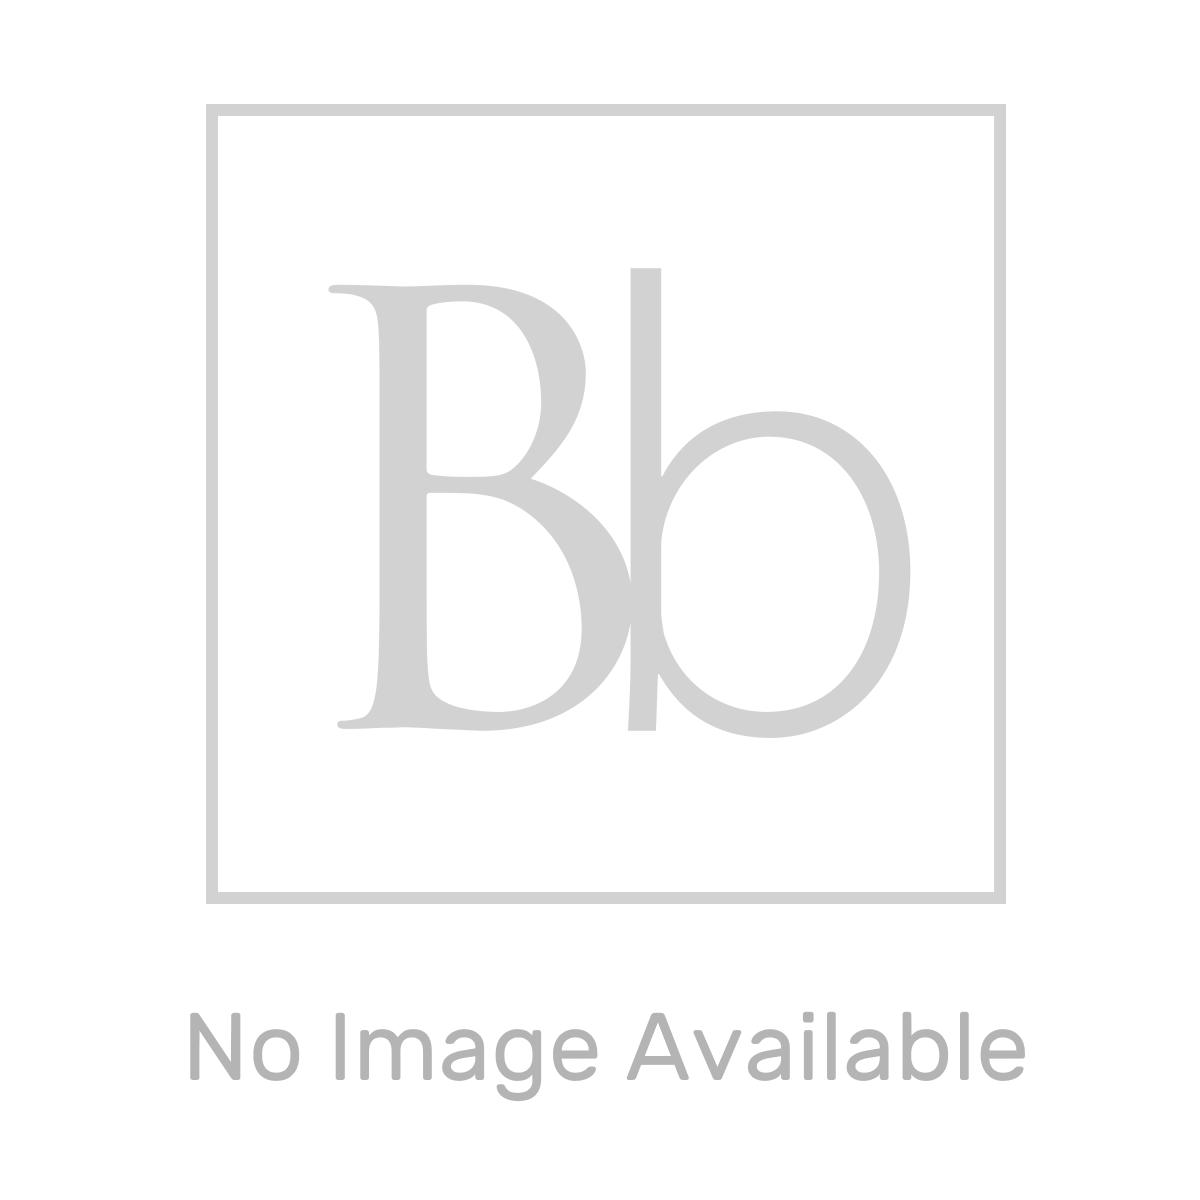 Elation Ikoma Bodega Grey Mirror Unit 850mm Dimensions